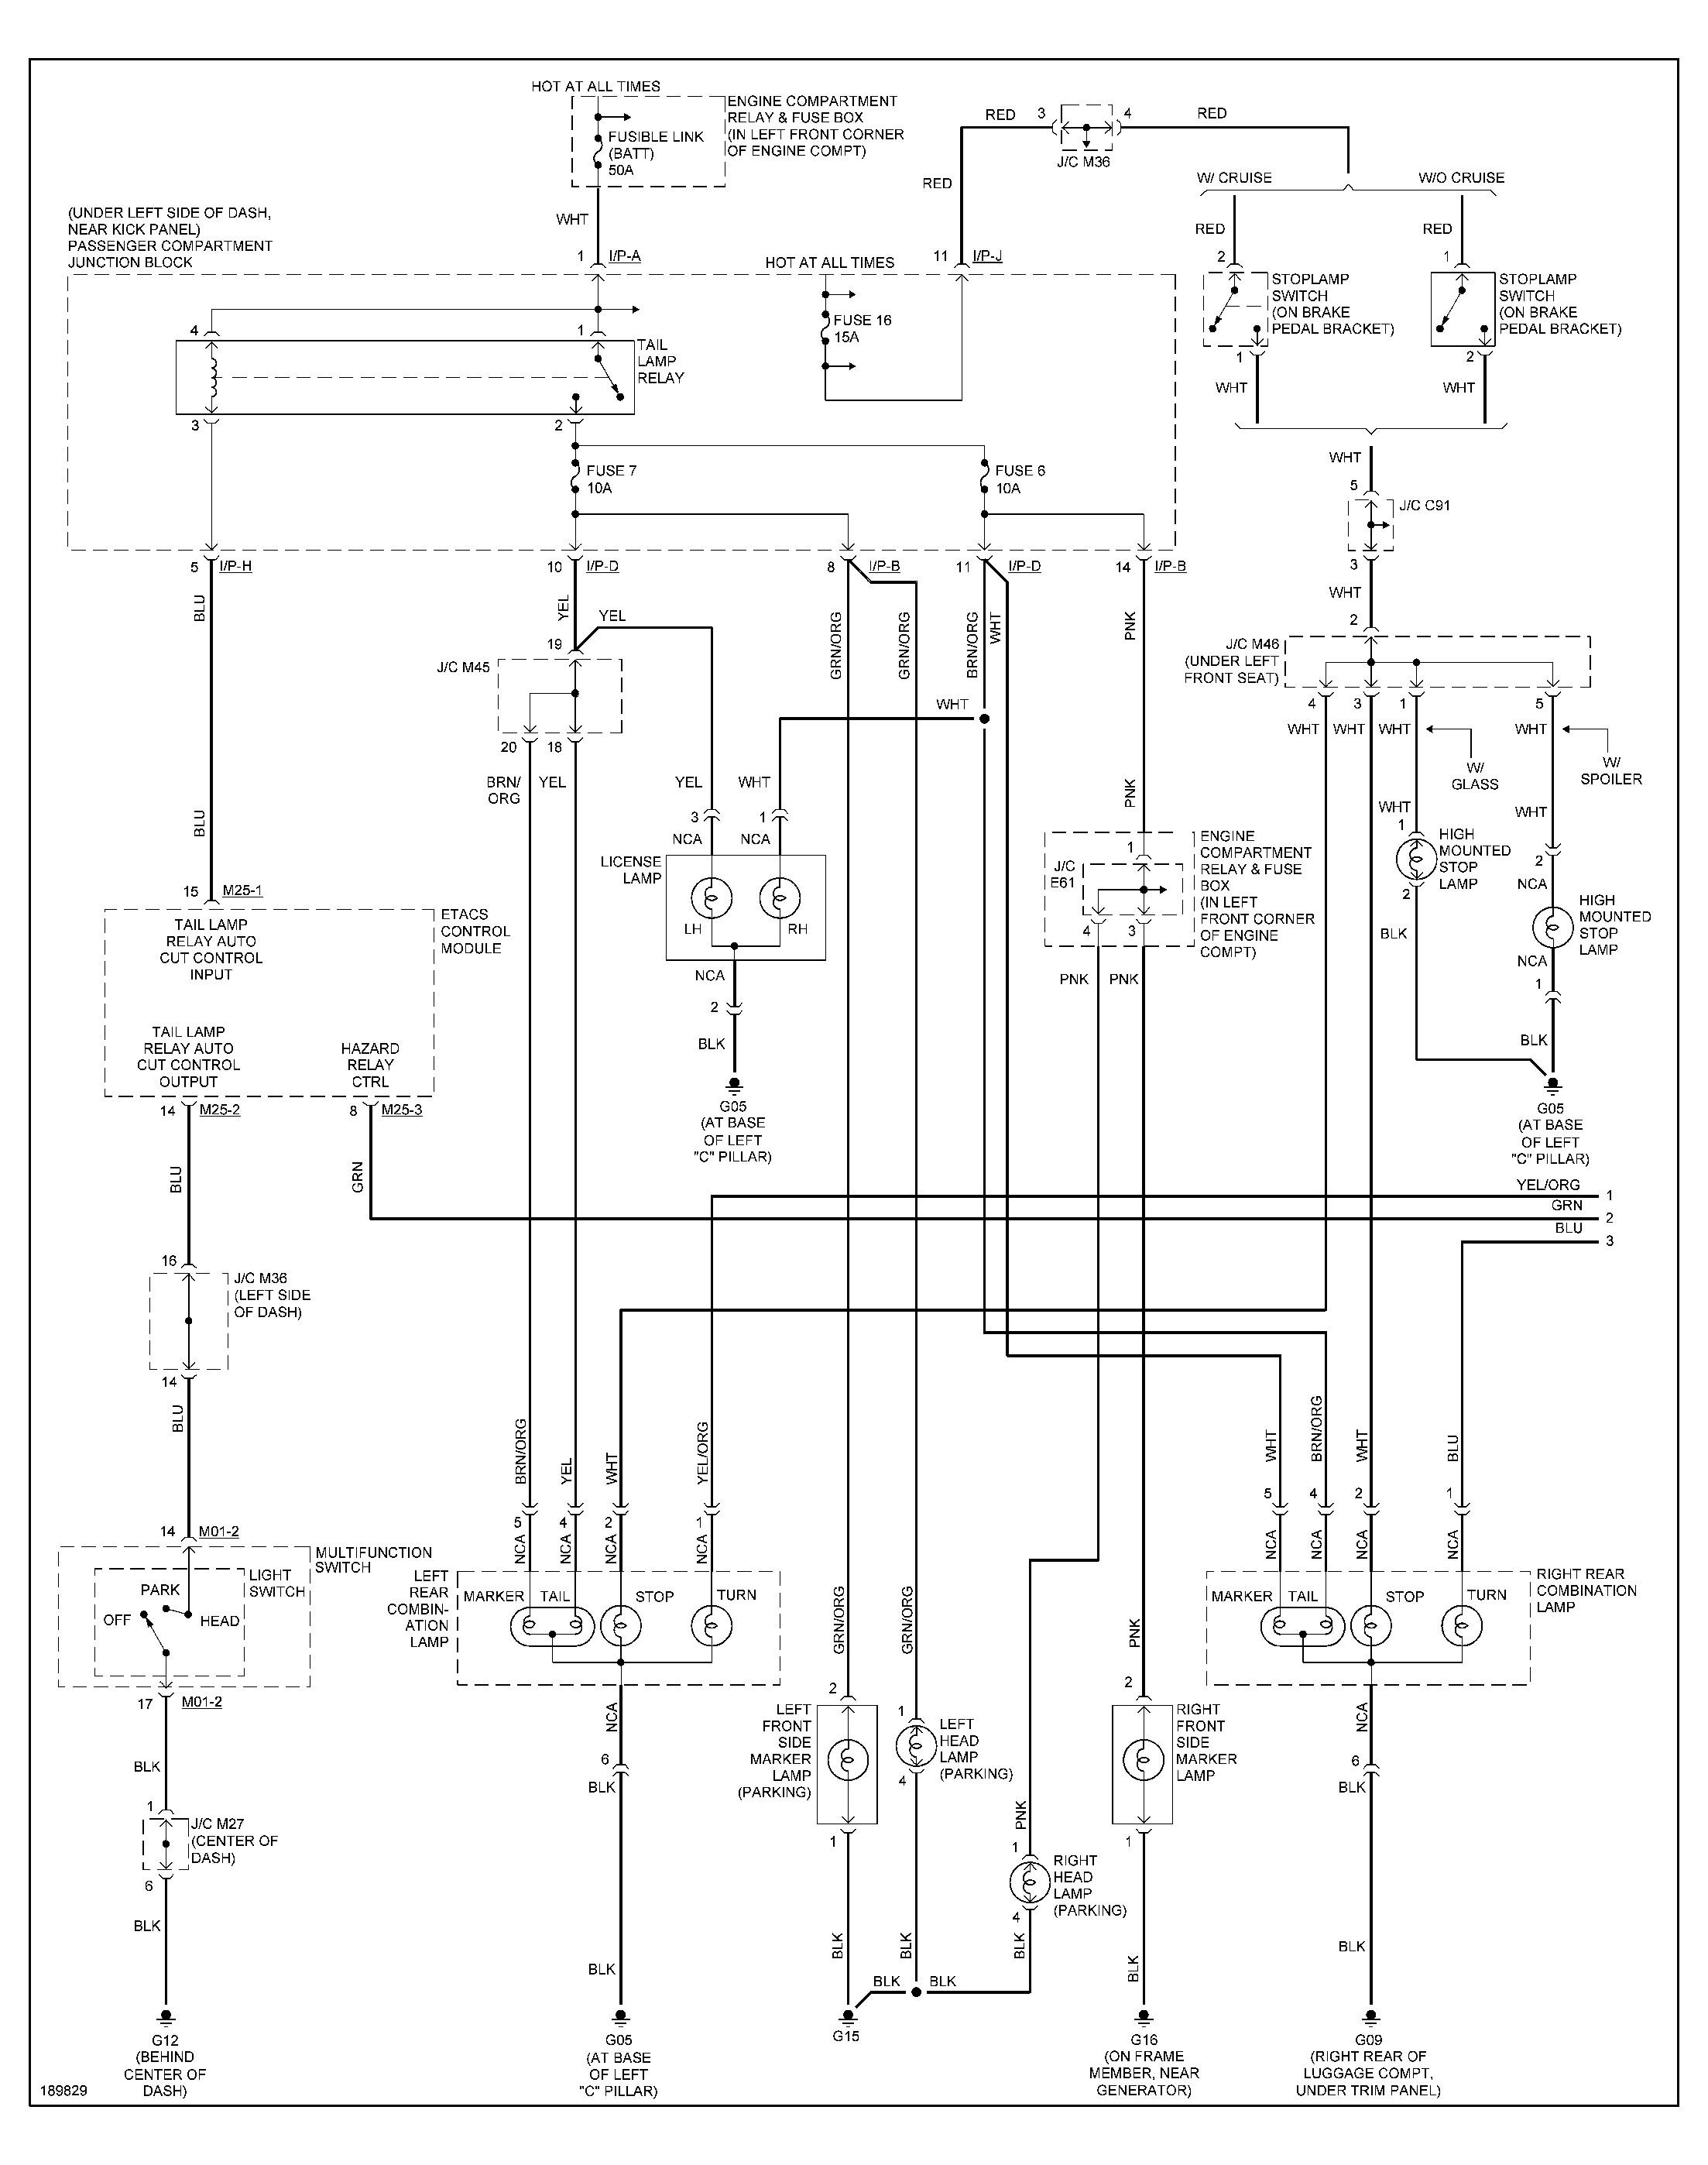 Suzuki Forenza Wiring Diagram Wiring Diagrams Recover Recover Chatteriedelavalleedufelin Fr